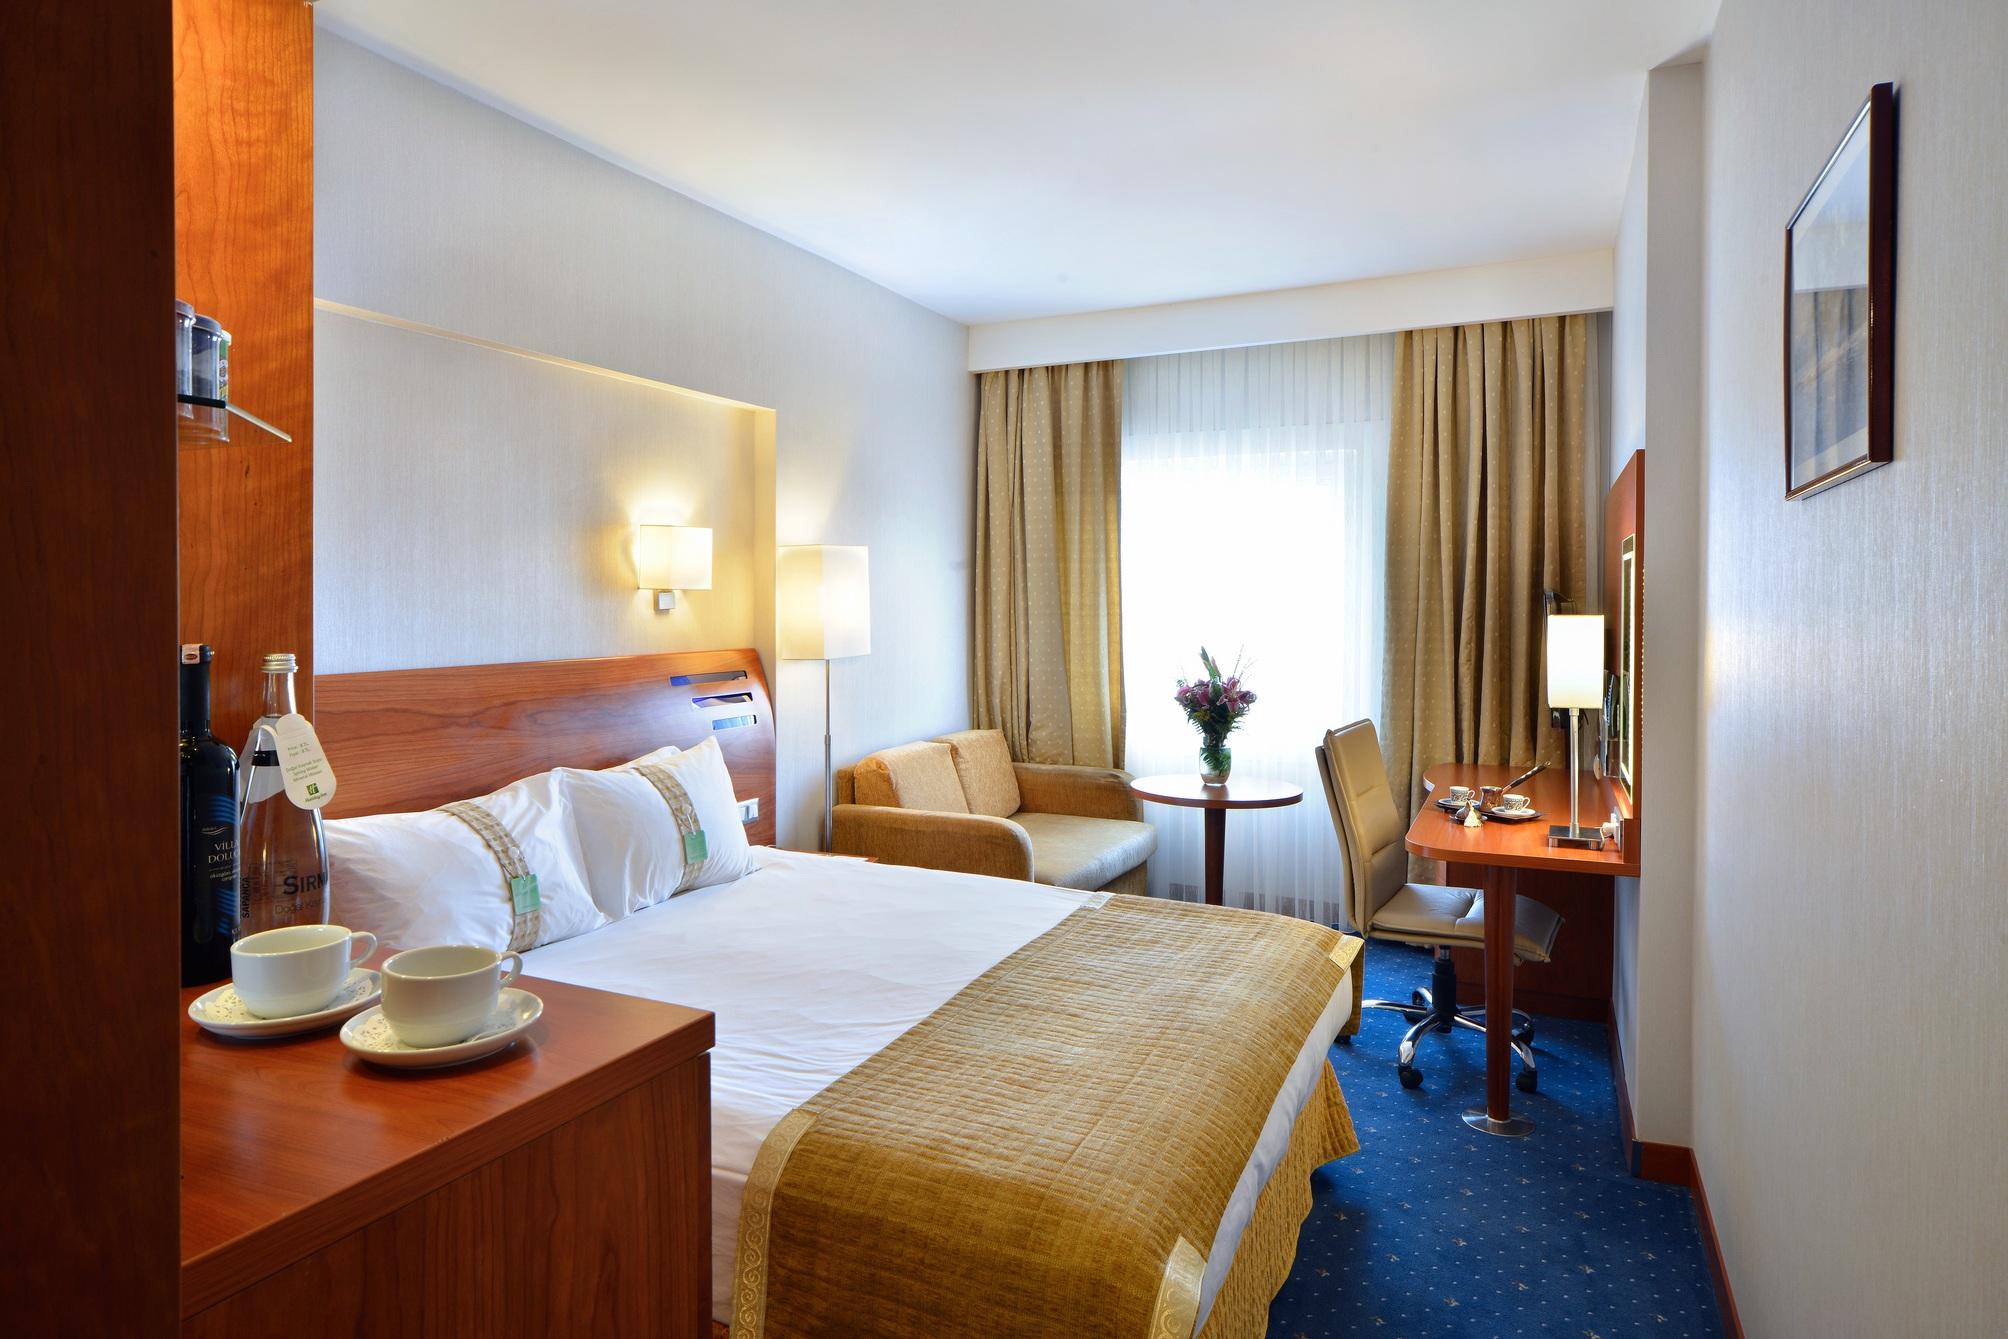 HotelHoliday Inn Istanbul City